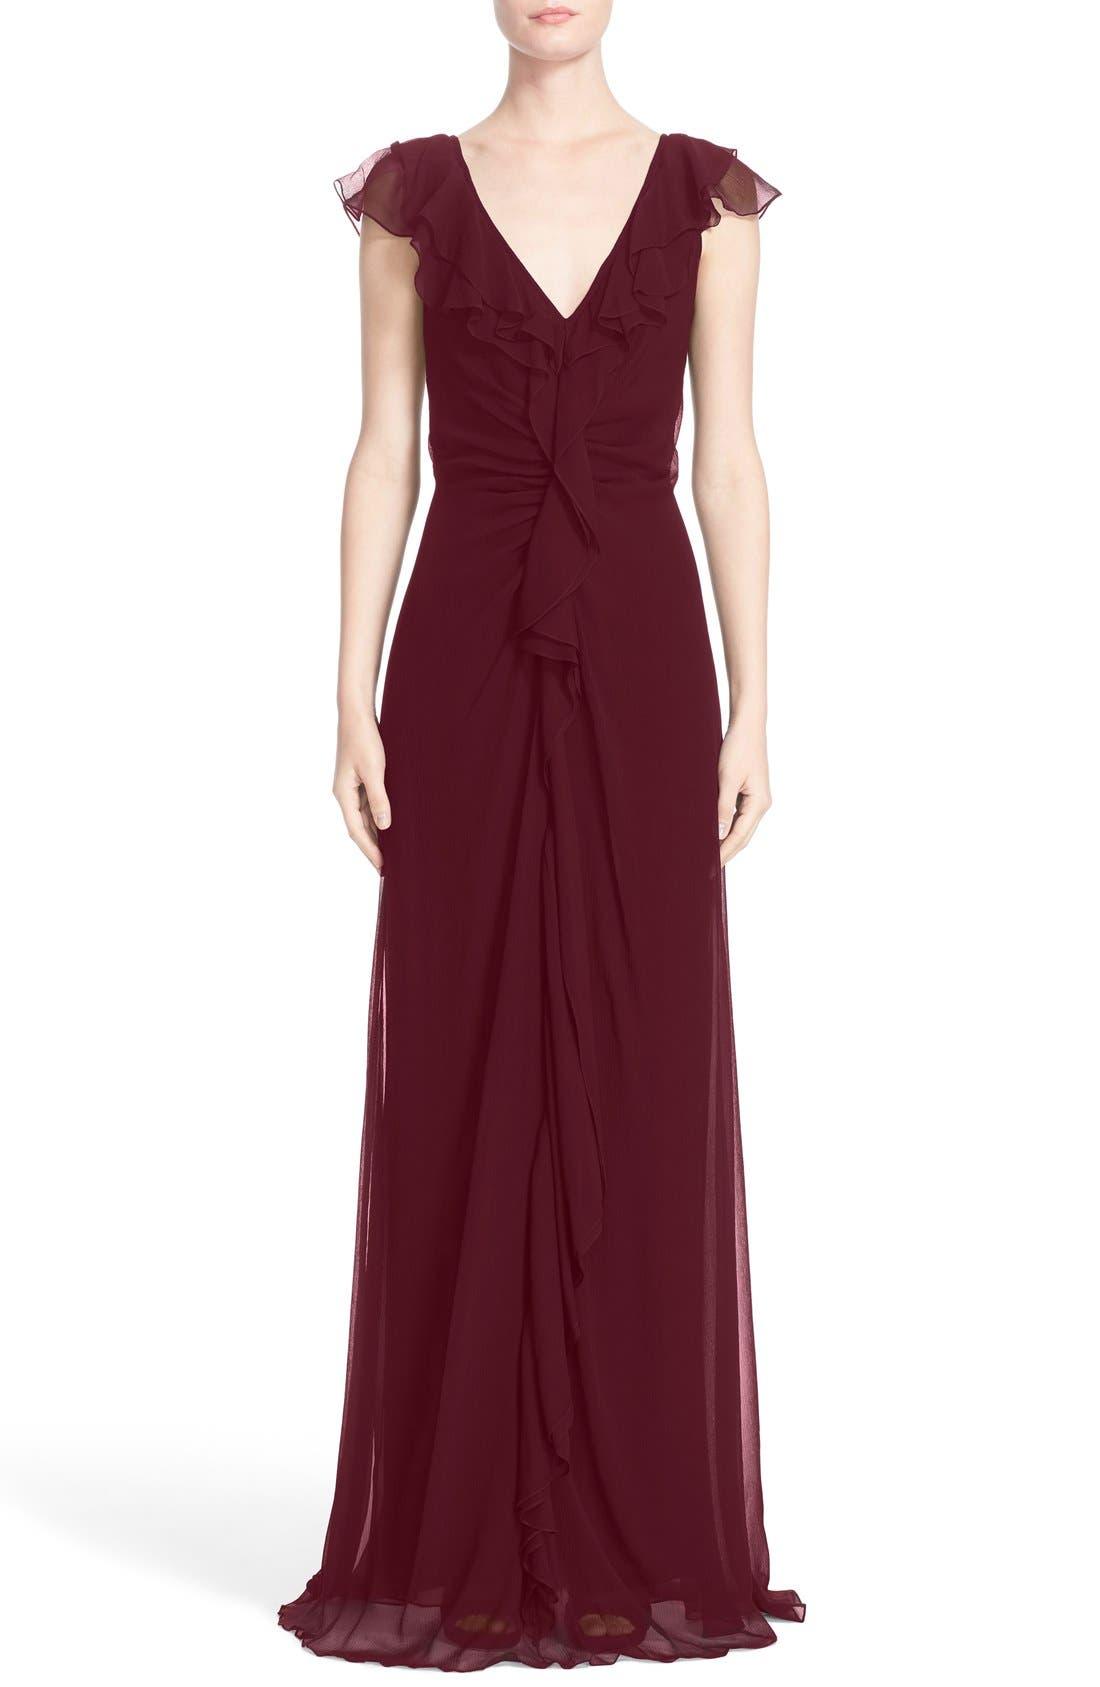 Main Image - Carolina Herrera Ruffle Detail Silk Chiffon V-Neck Gown